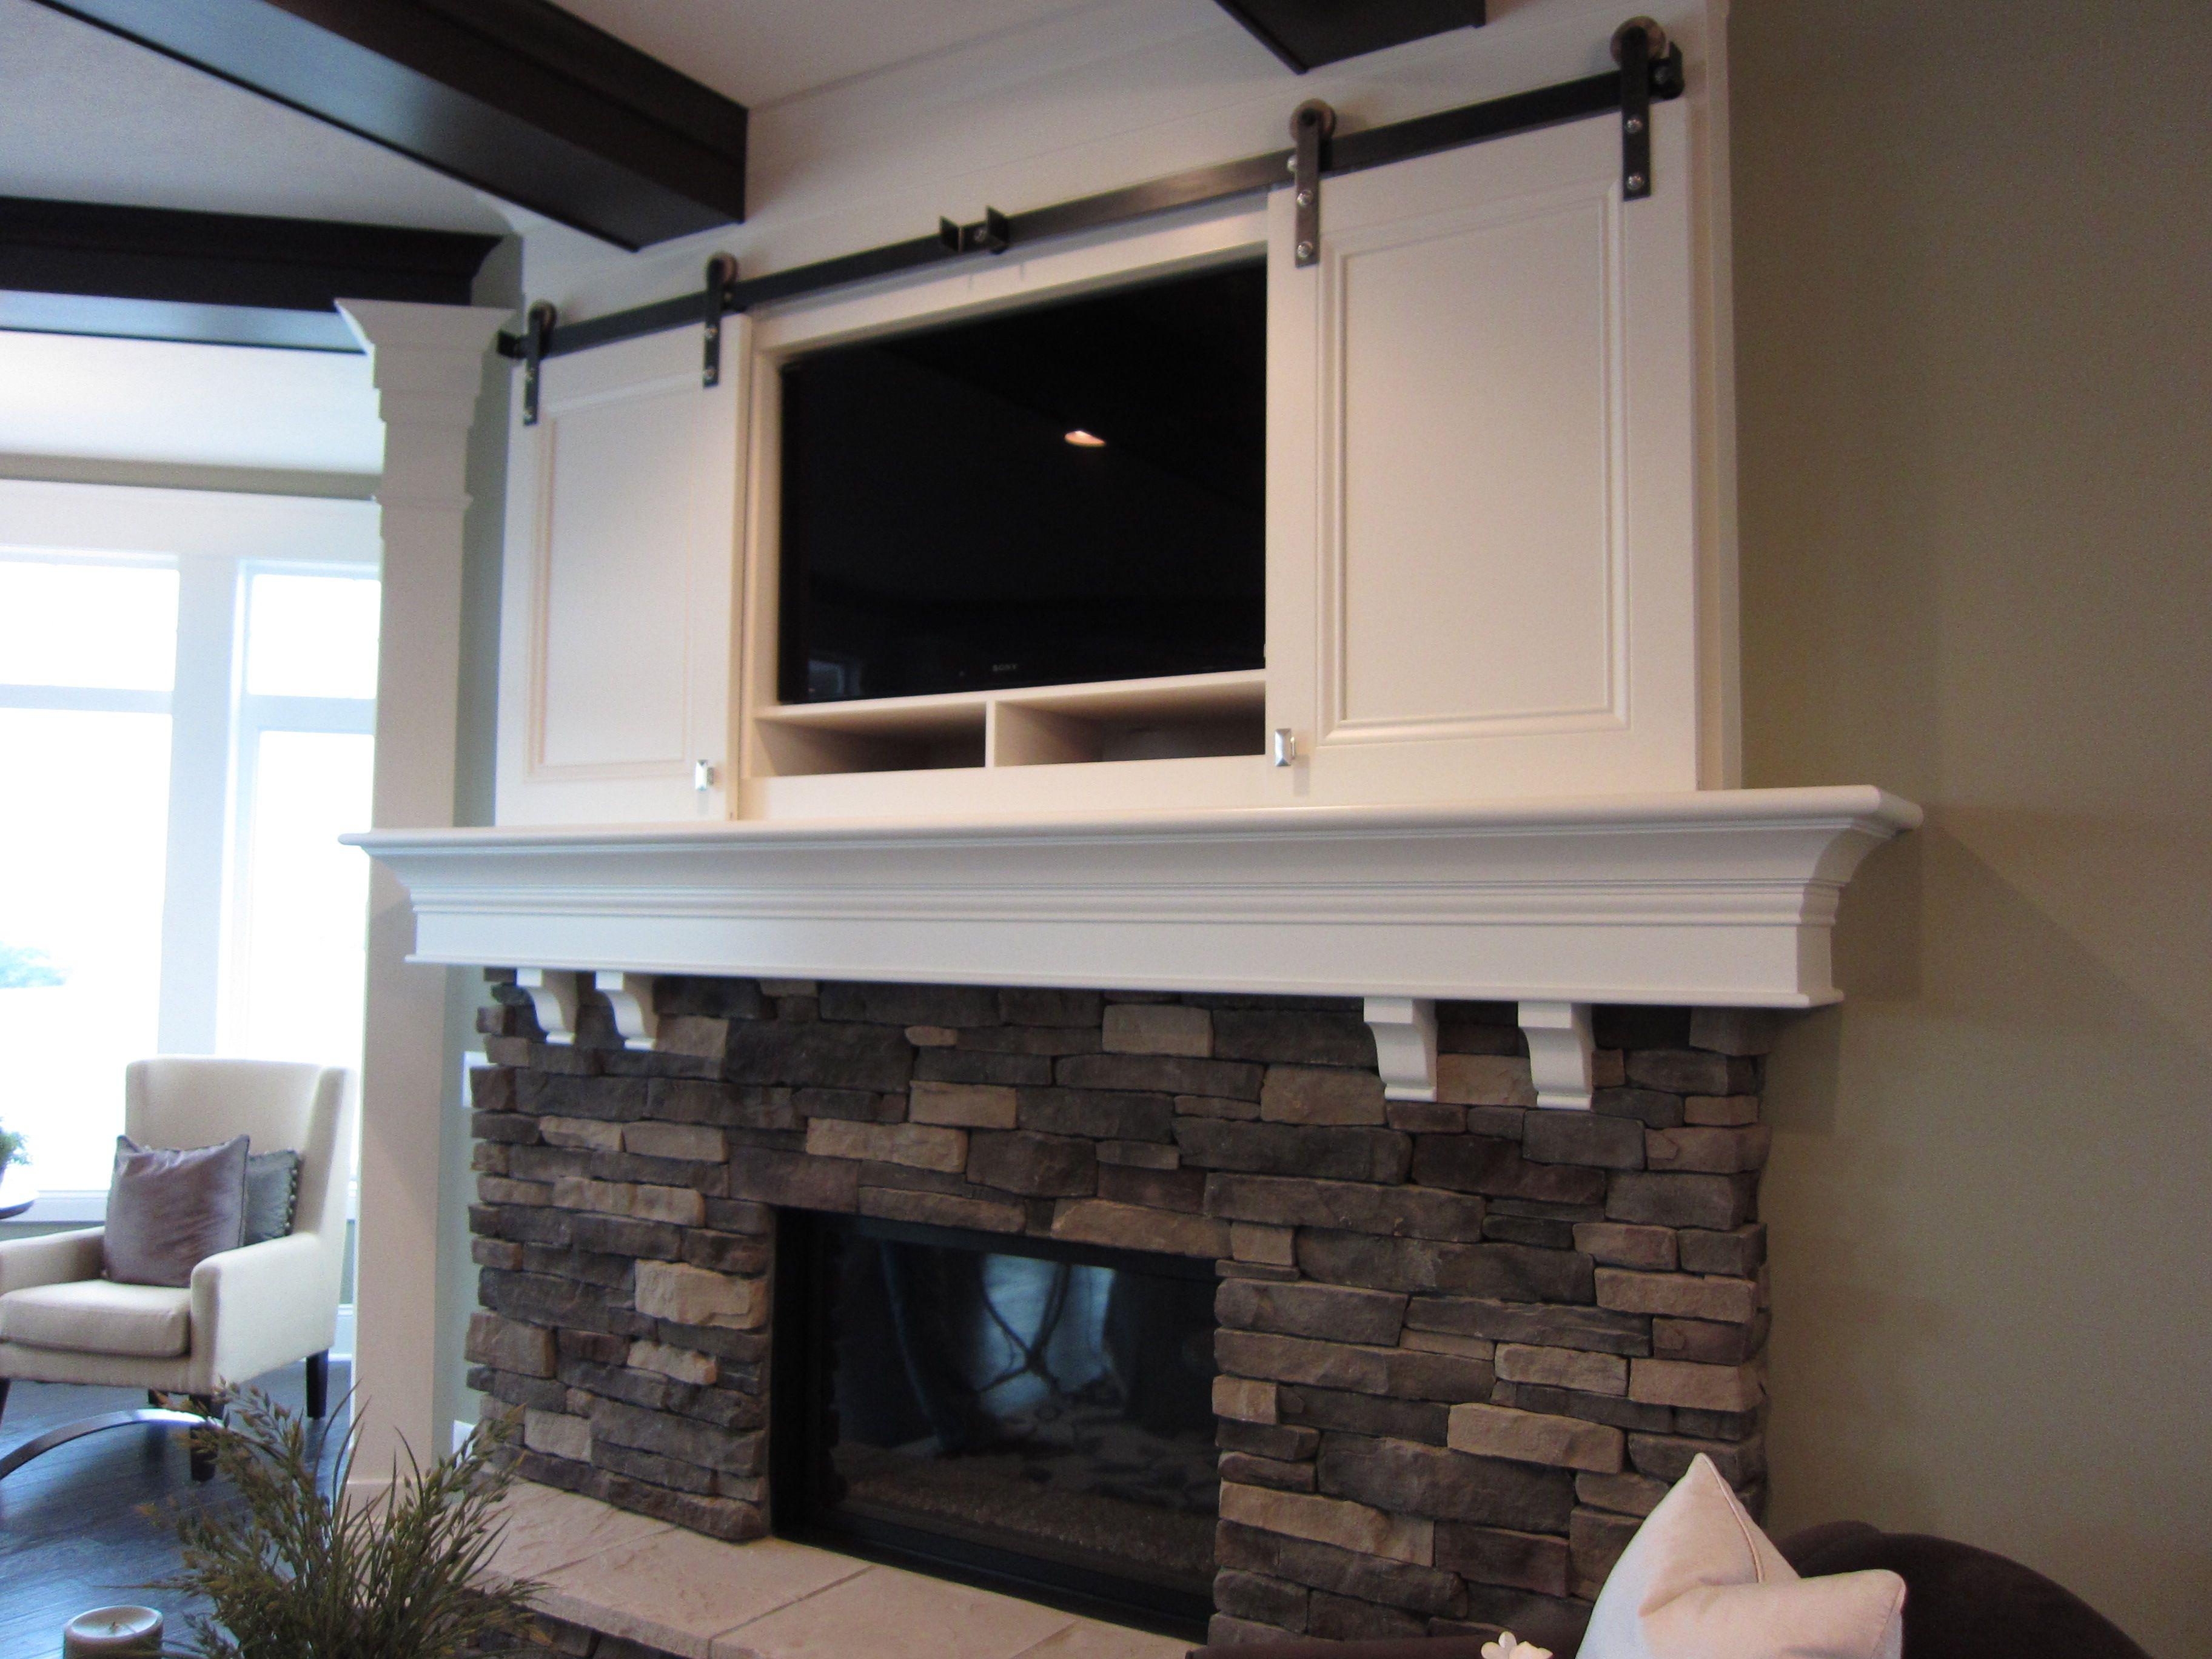 Tv Above Fireplace Ideas Best Of Fireplace Tv Mantel Ideas Best 25 Tv Above Fireplace Ideas